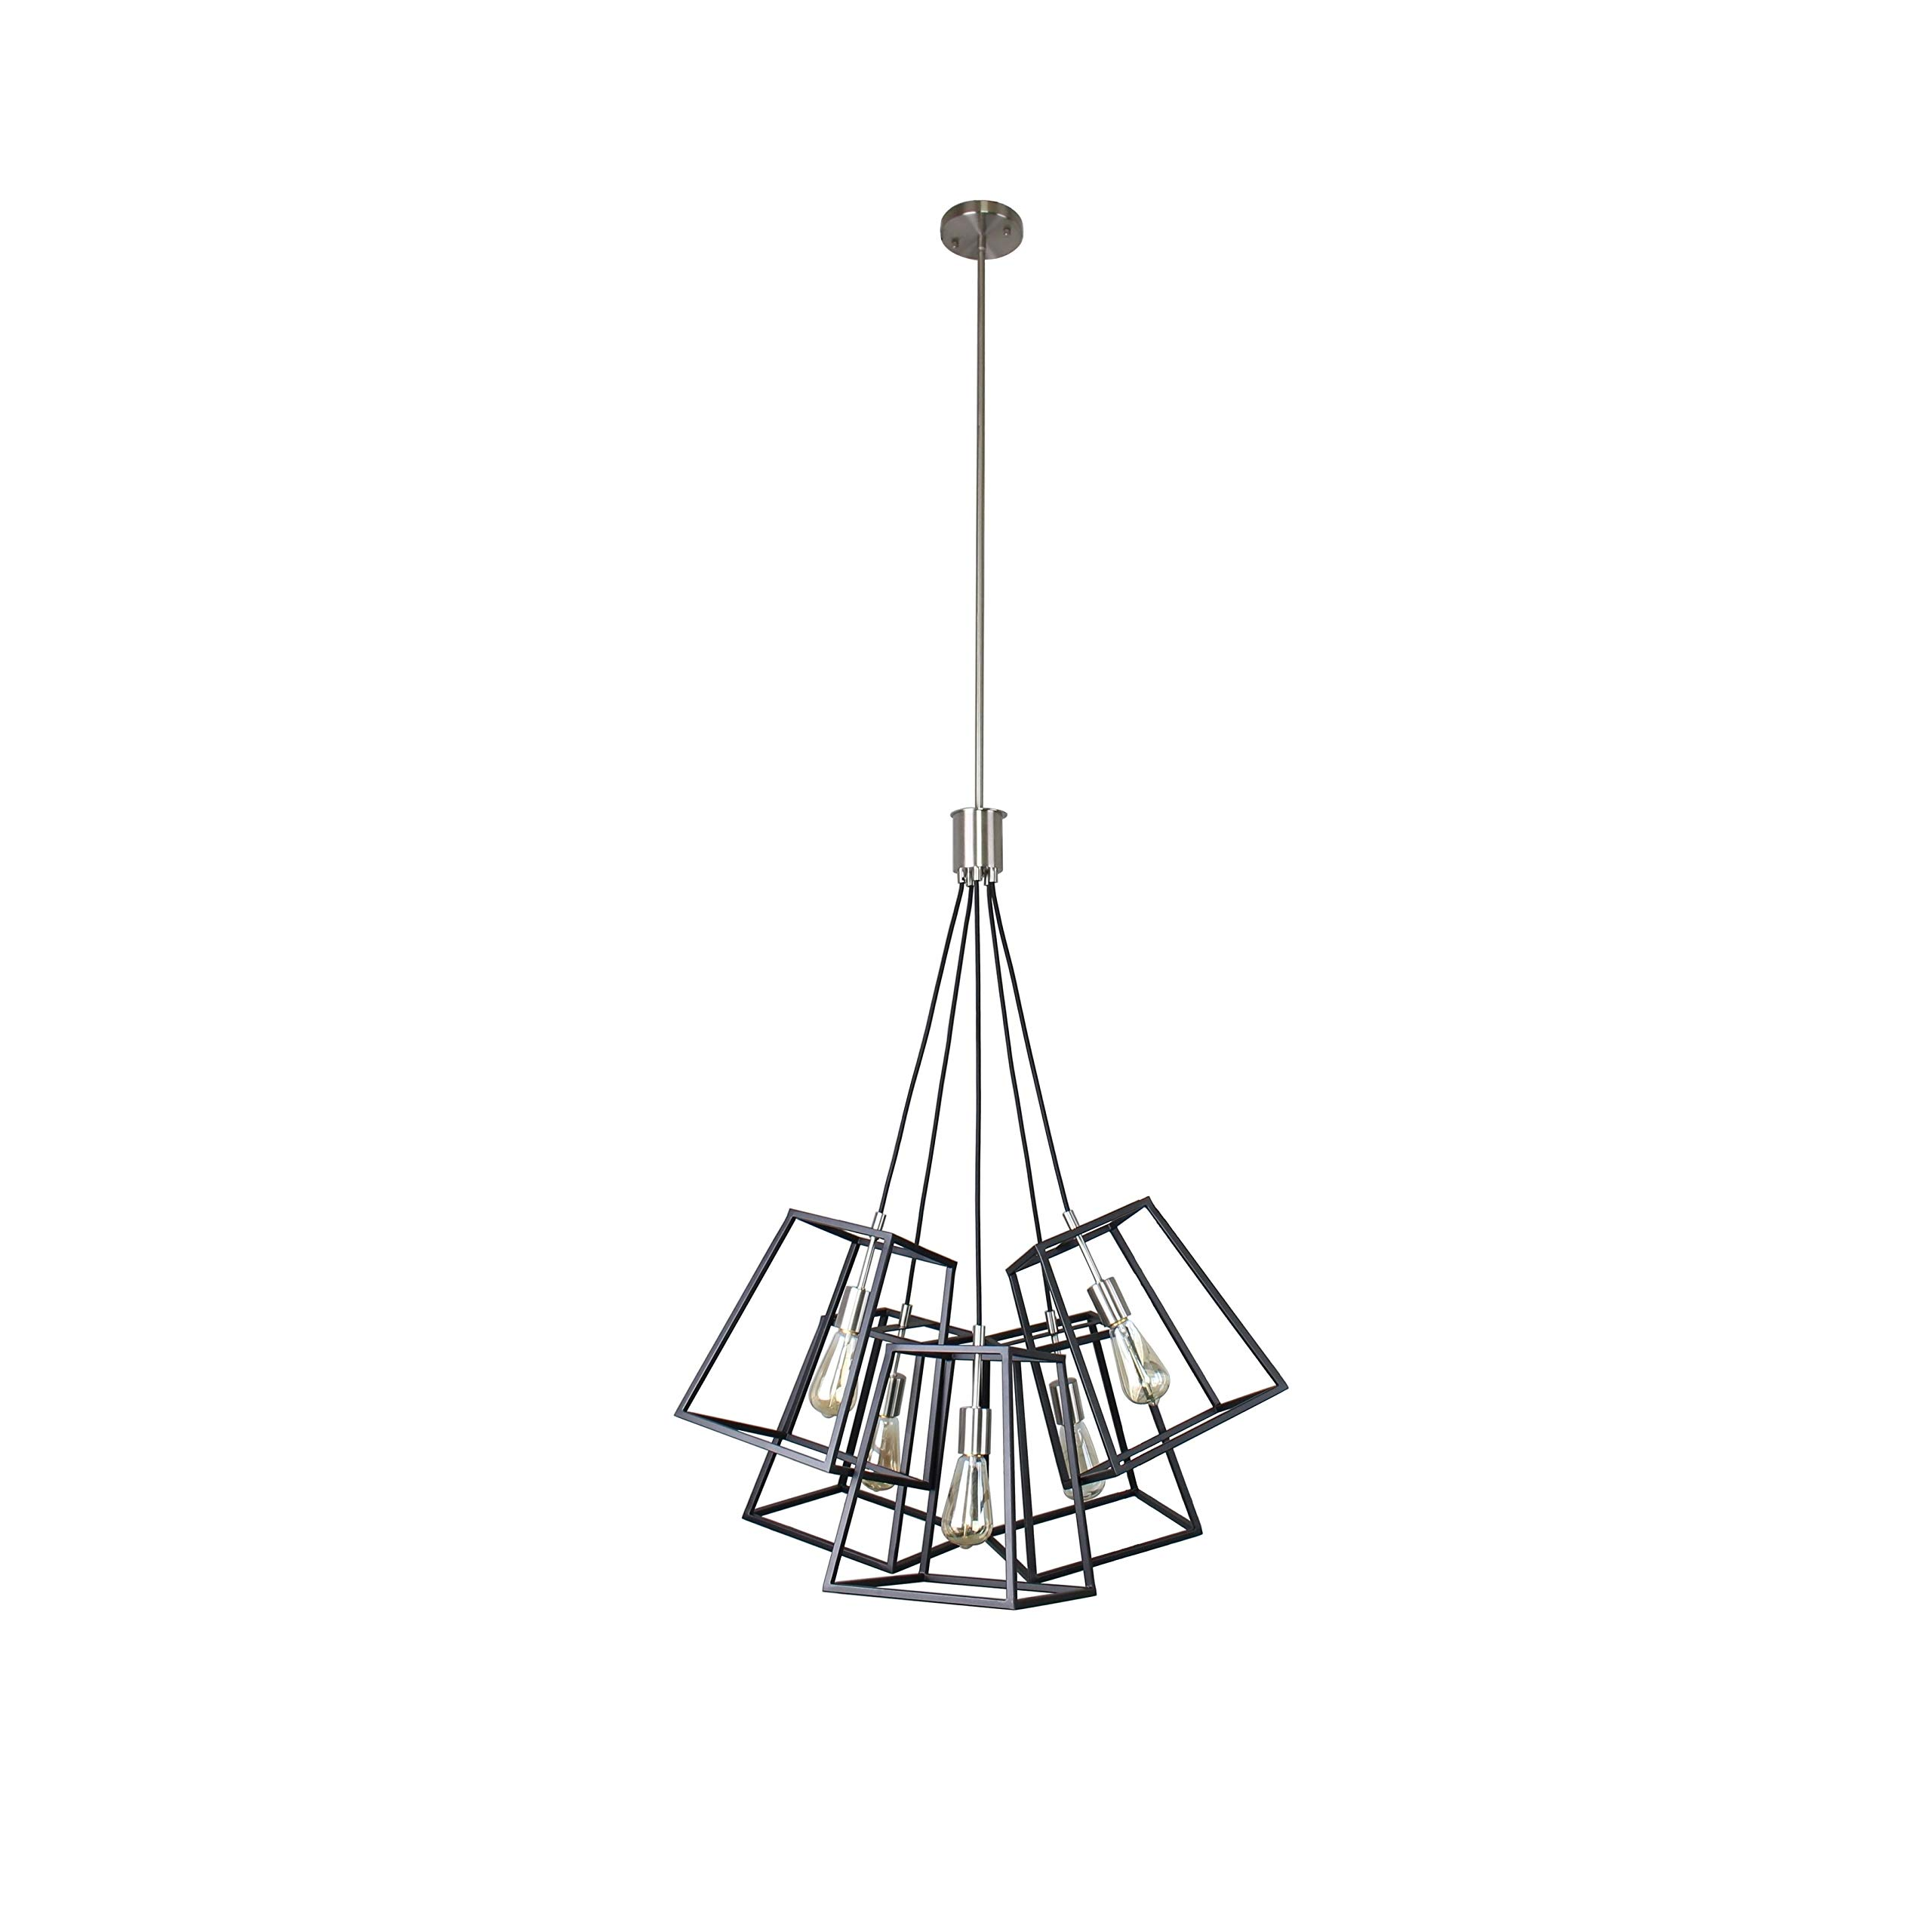 BELDI 21920-H5 Sarah Lighting Fixture, Black